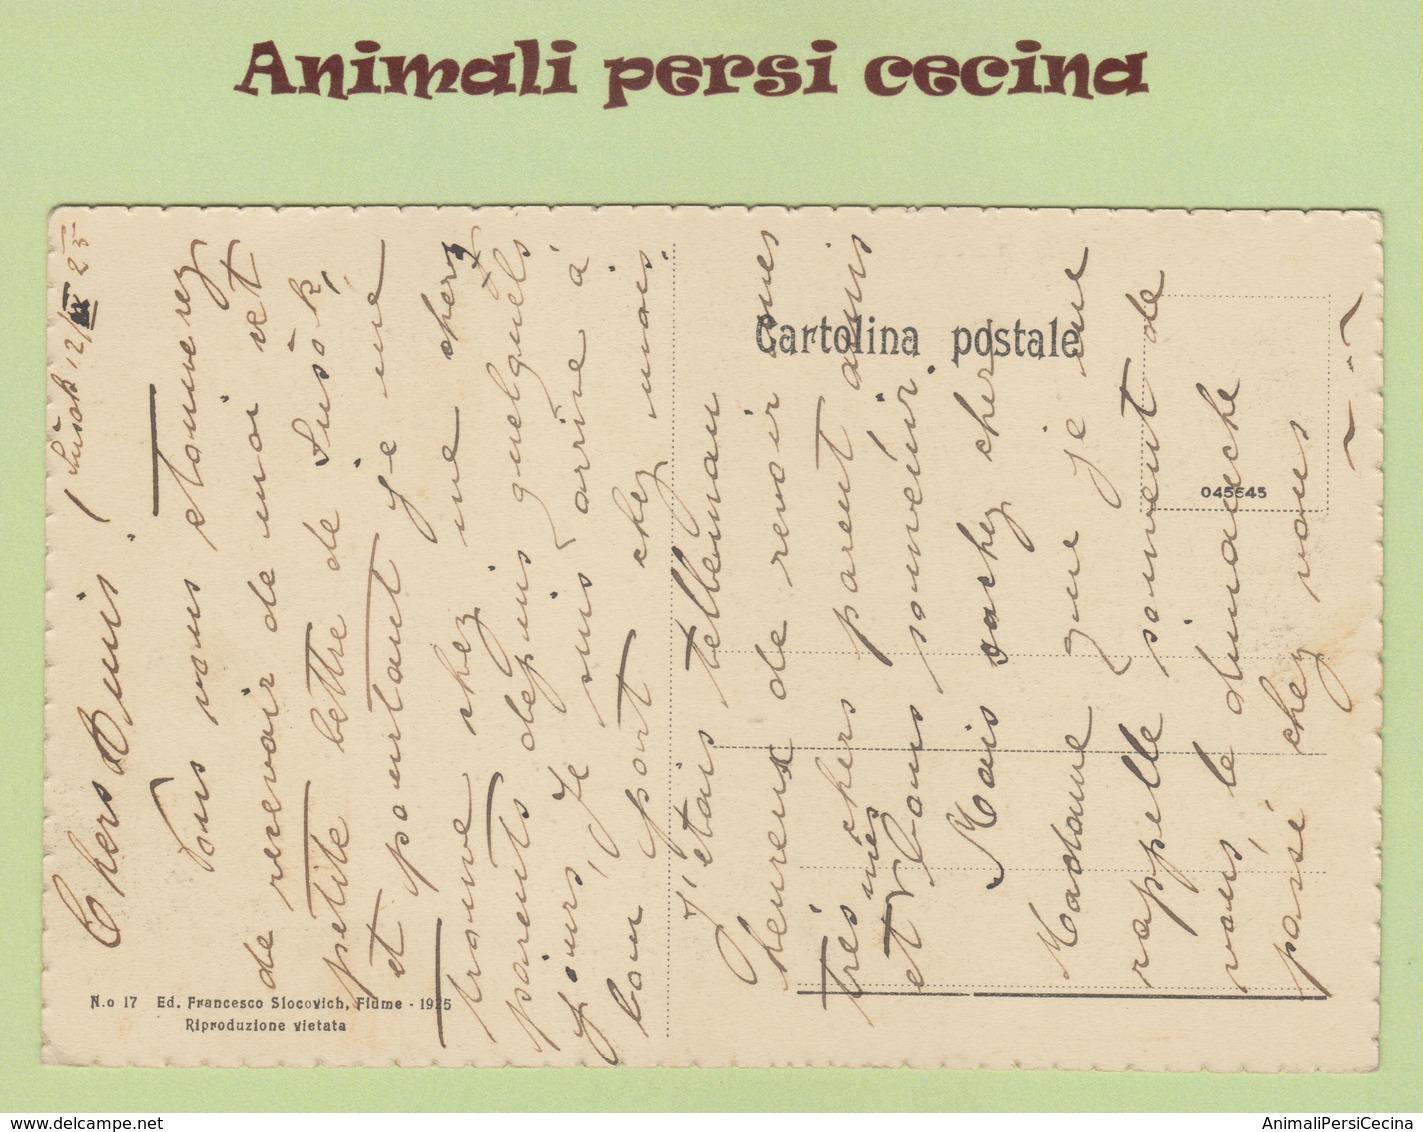 FIUME RIJEKA - PIAZZA GIUSEPPE VERDI - CARTOLINA - LT60-019 - Croazia